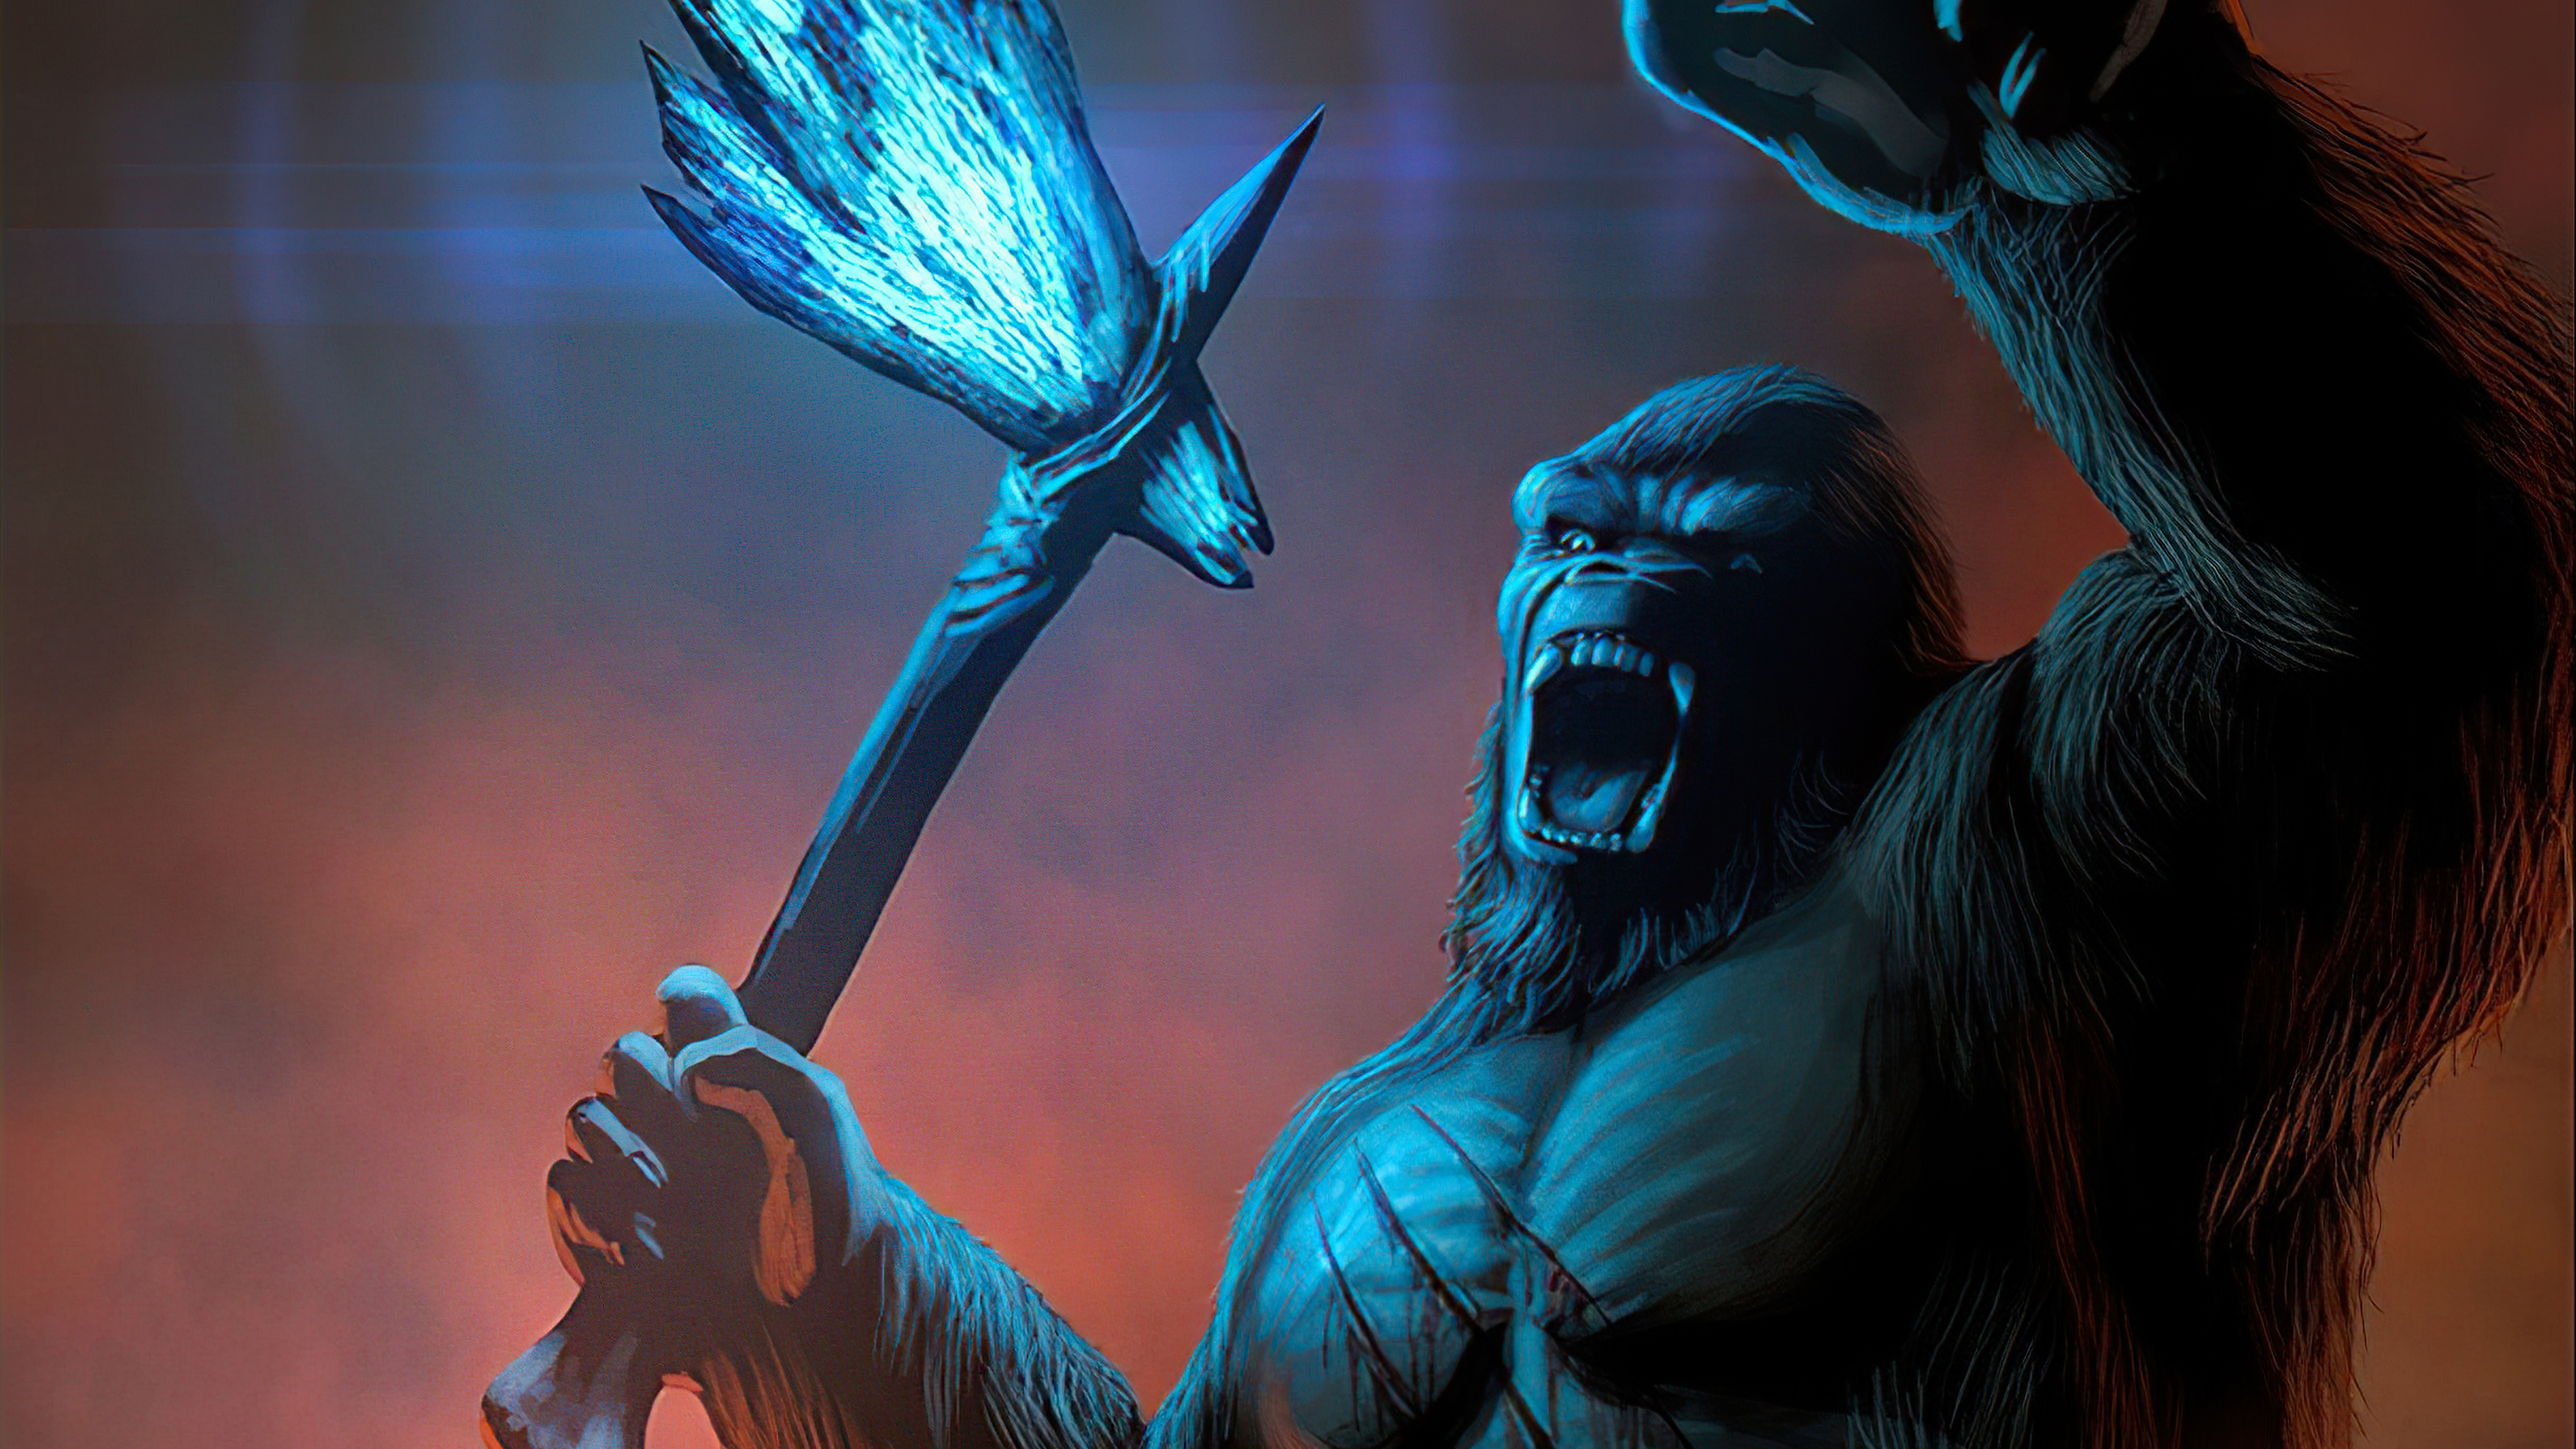 Cool Wallpapers King Kong